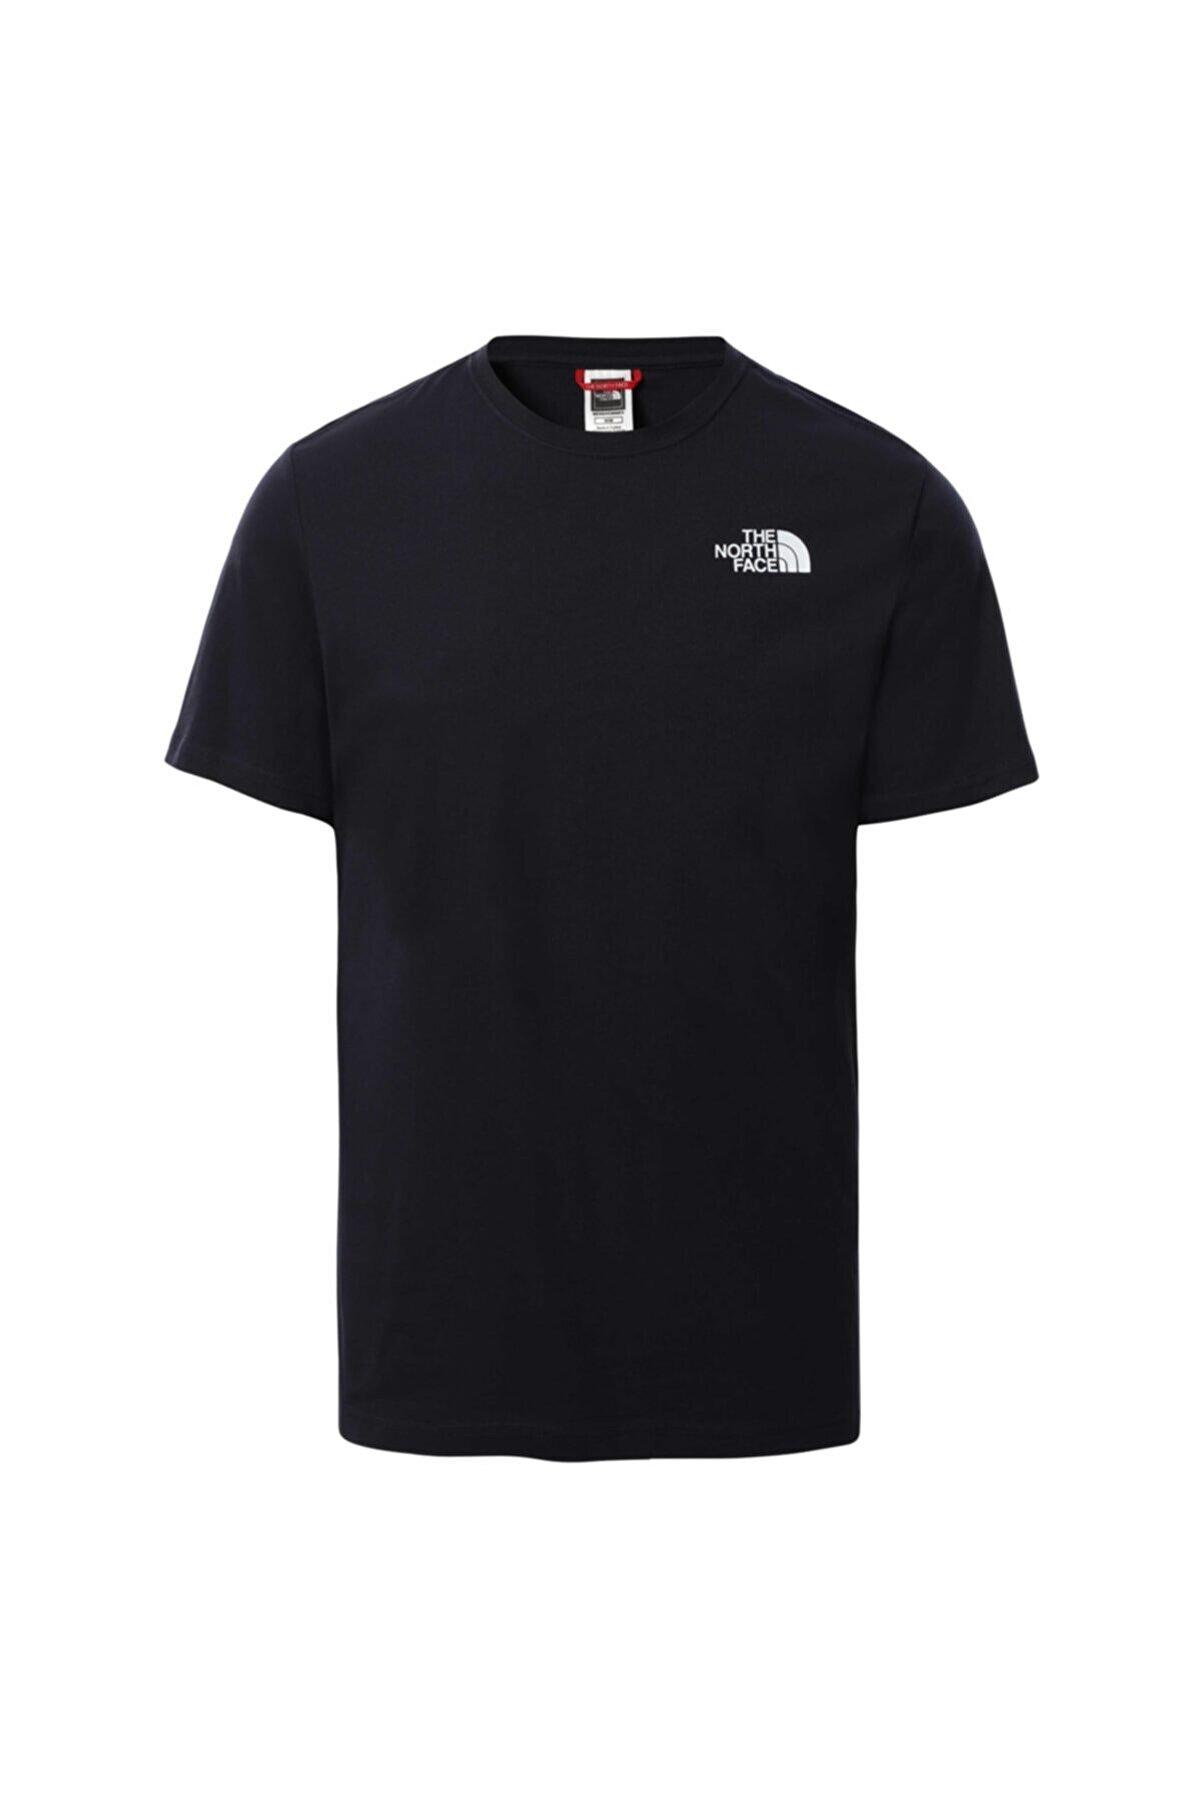 The North Face Erkek Redbox Tee T-shirt - T92tx20gz